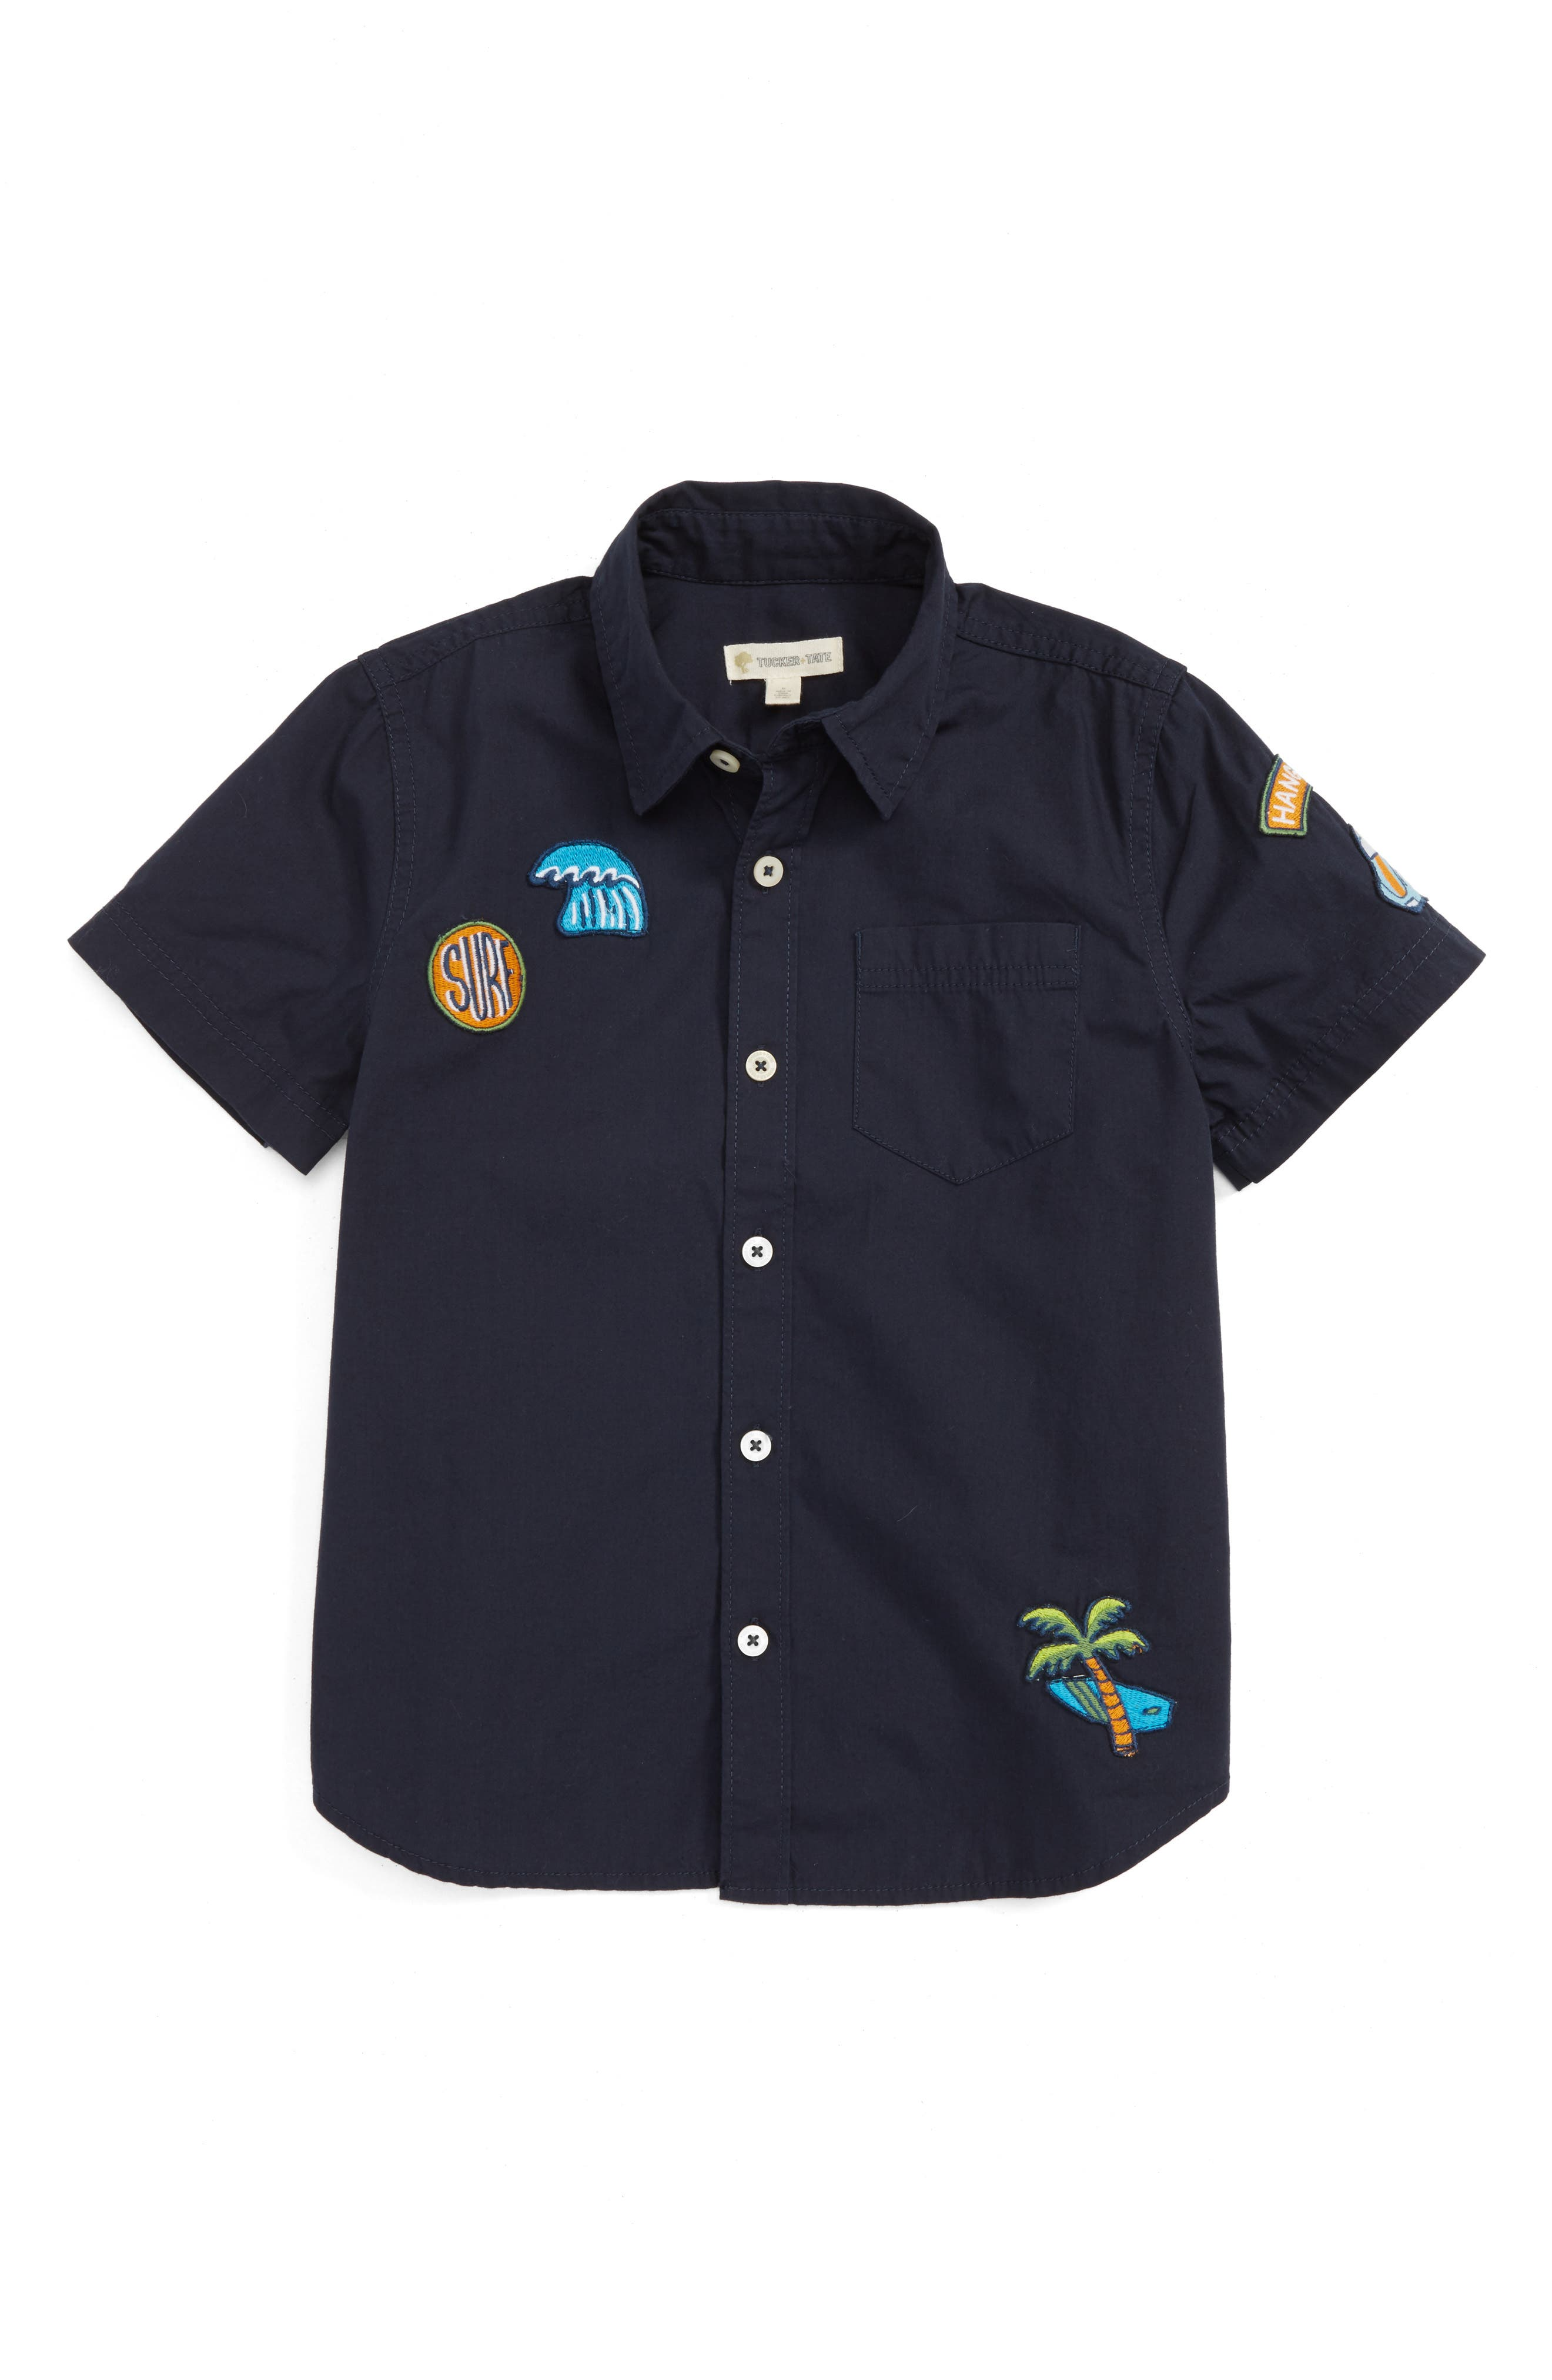 Main Image - Tucker + Tate Surf Patch Woven Shirt (Toddler Boys & Little Boys)